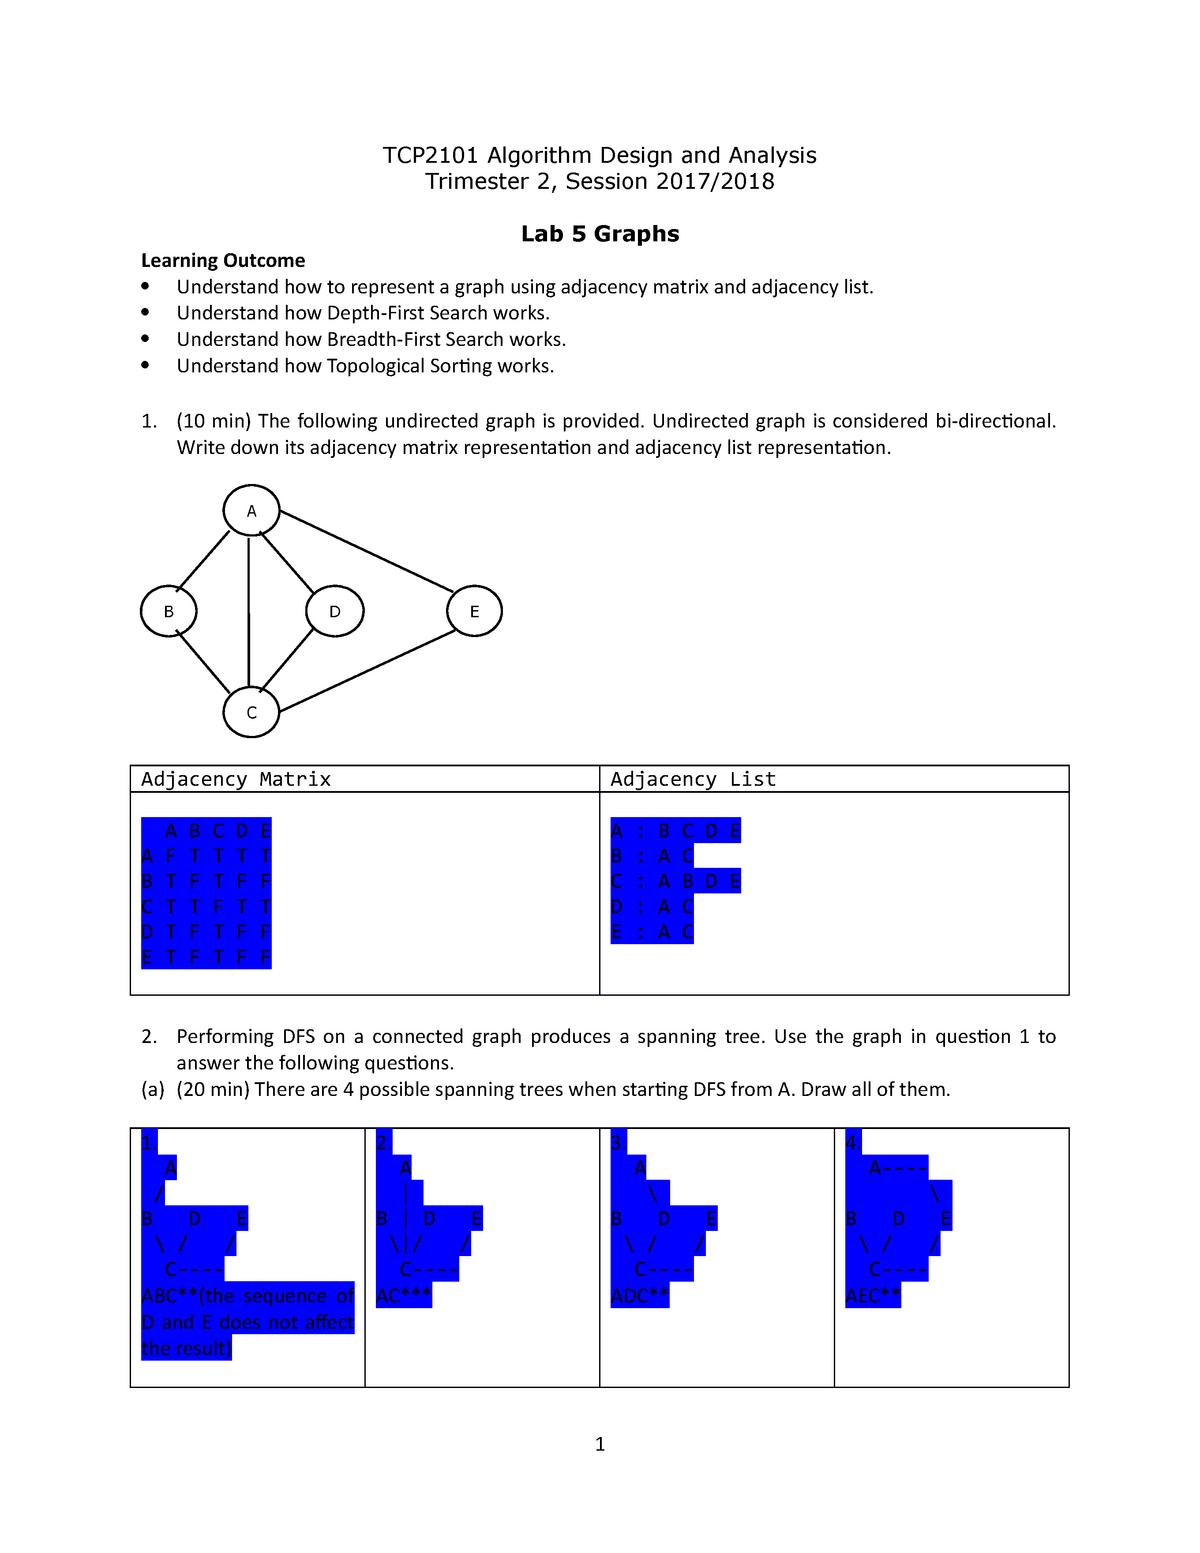 191764 Lab05 Graphs Sol - Algorithm Design and Analysis